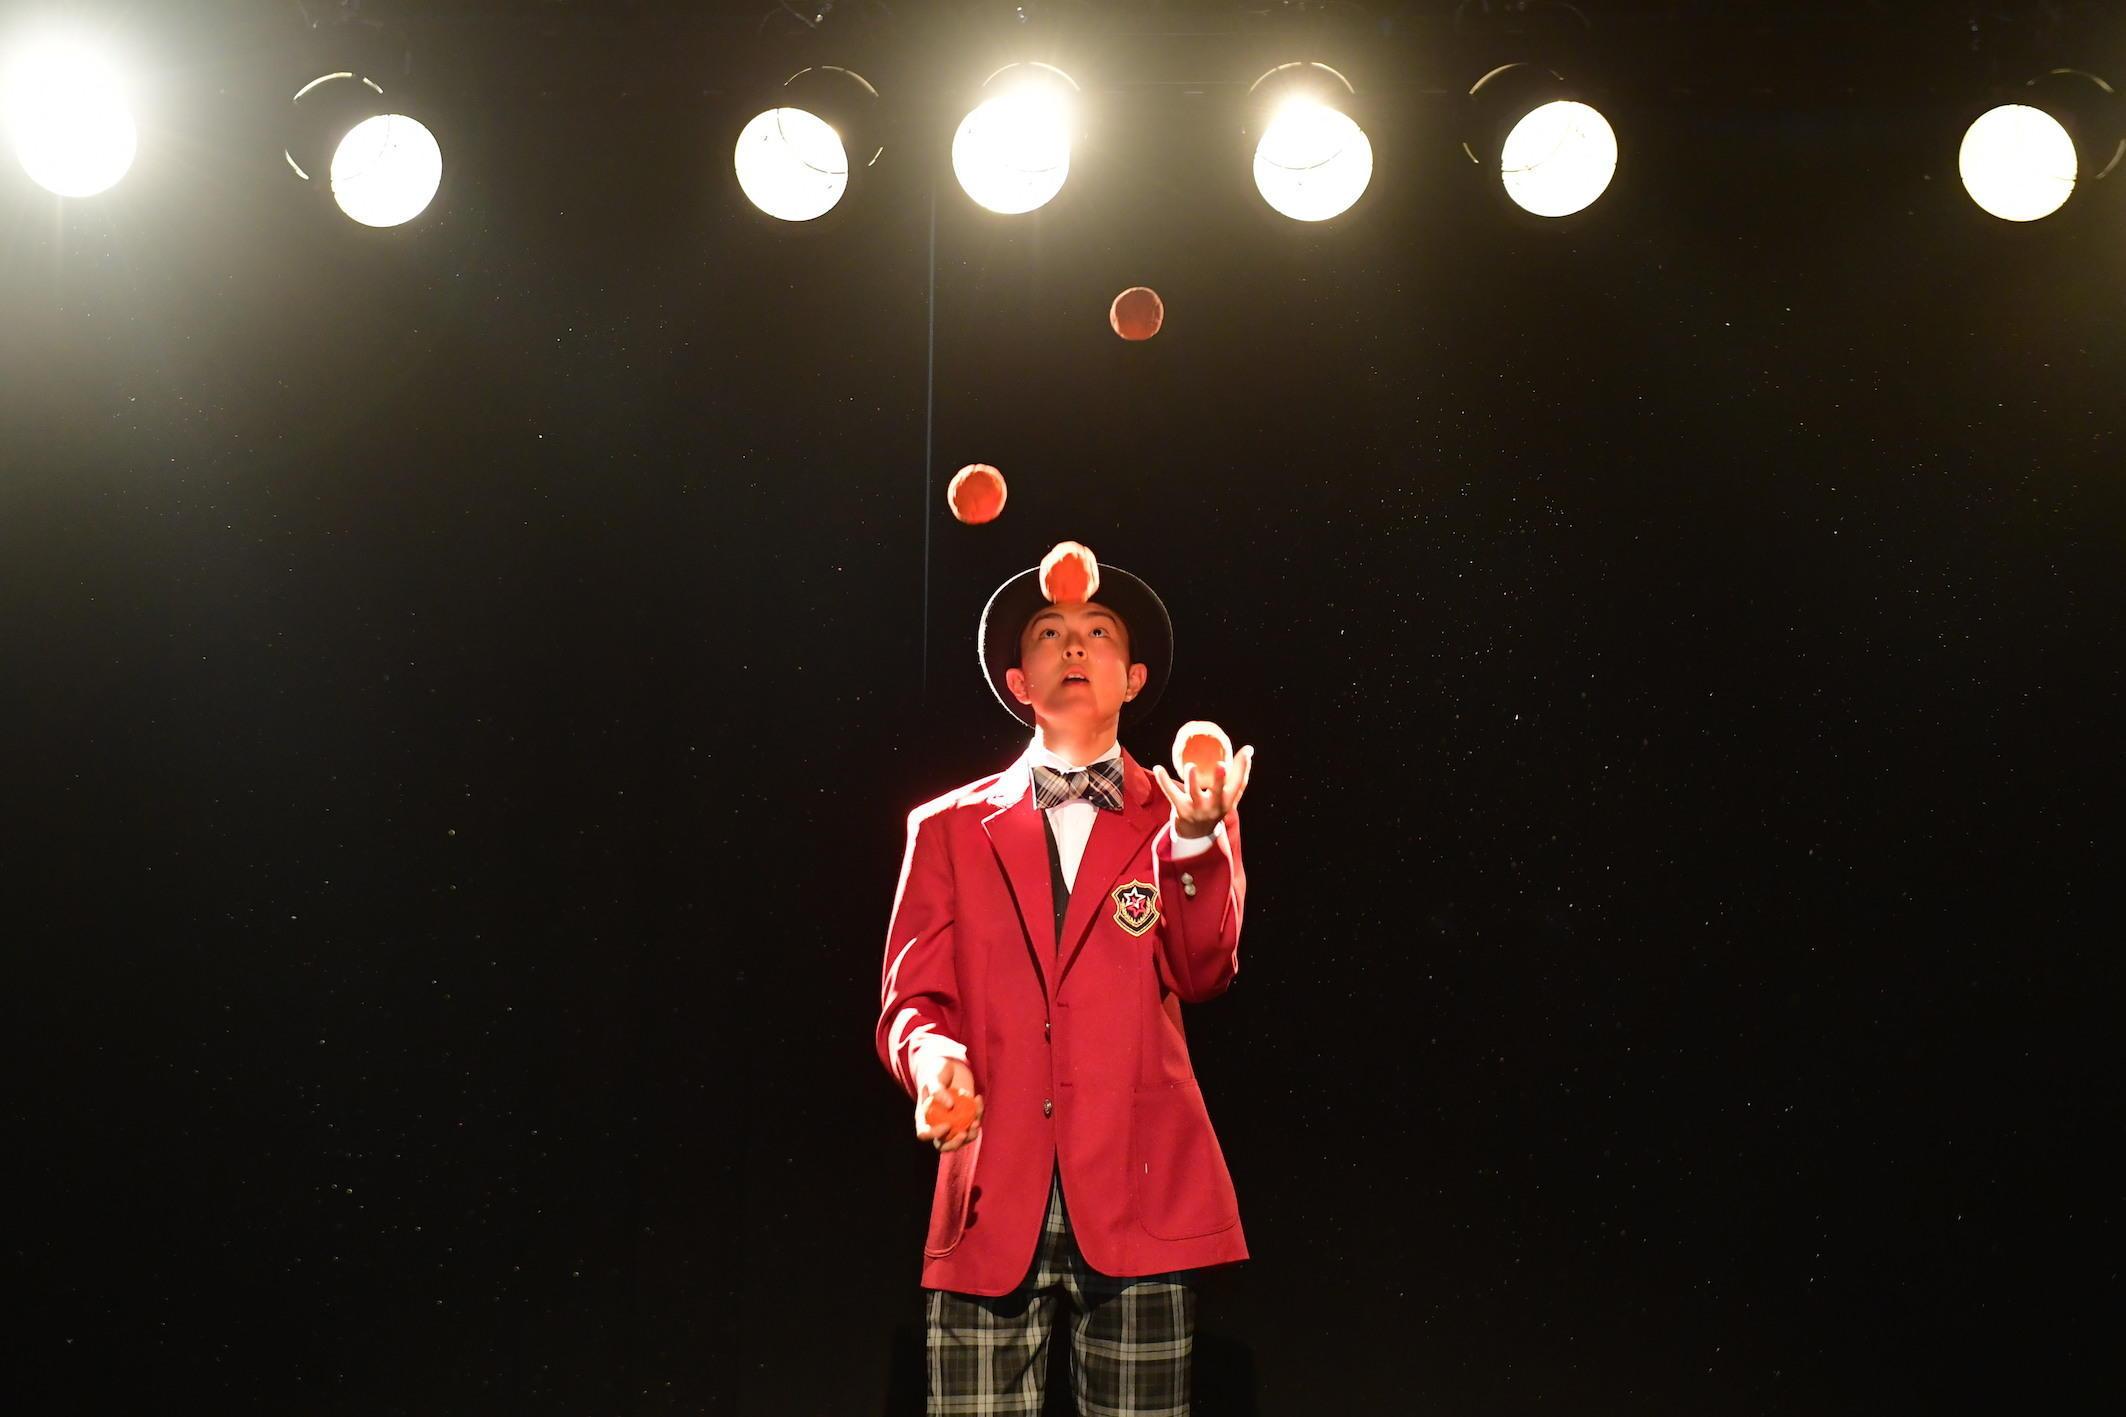 http://news.yoshimoto.co.jp/20190131105436-6a0eed04dafd264905ace97a5b5b30e519ba9318.jpg